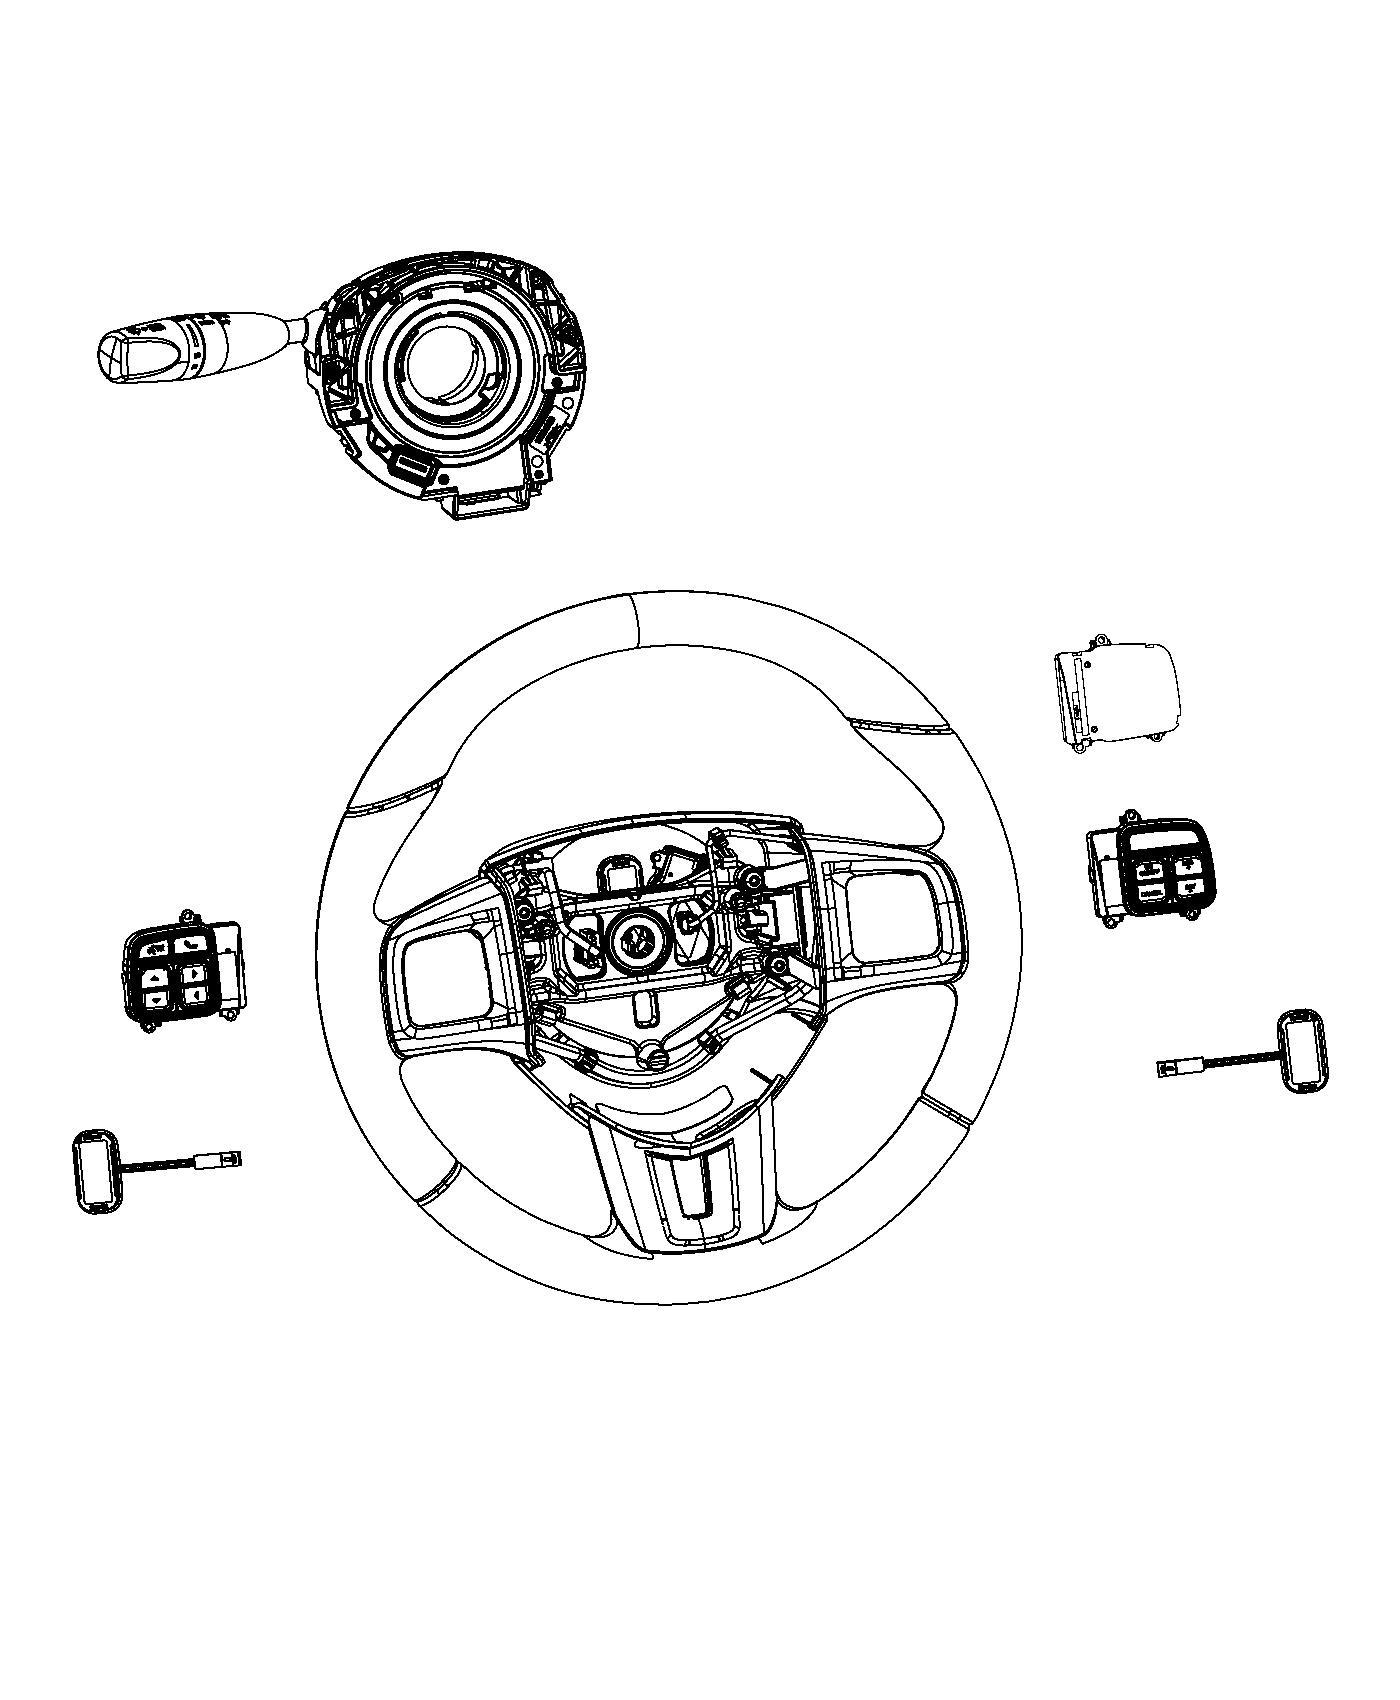 2012 Dodge Dart Module. Steering control. Trim: [all trim